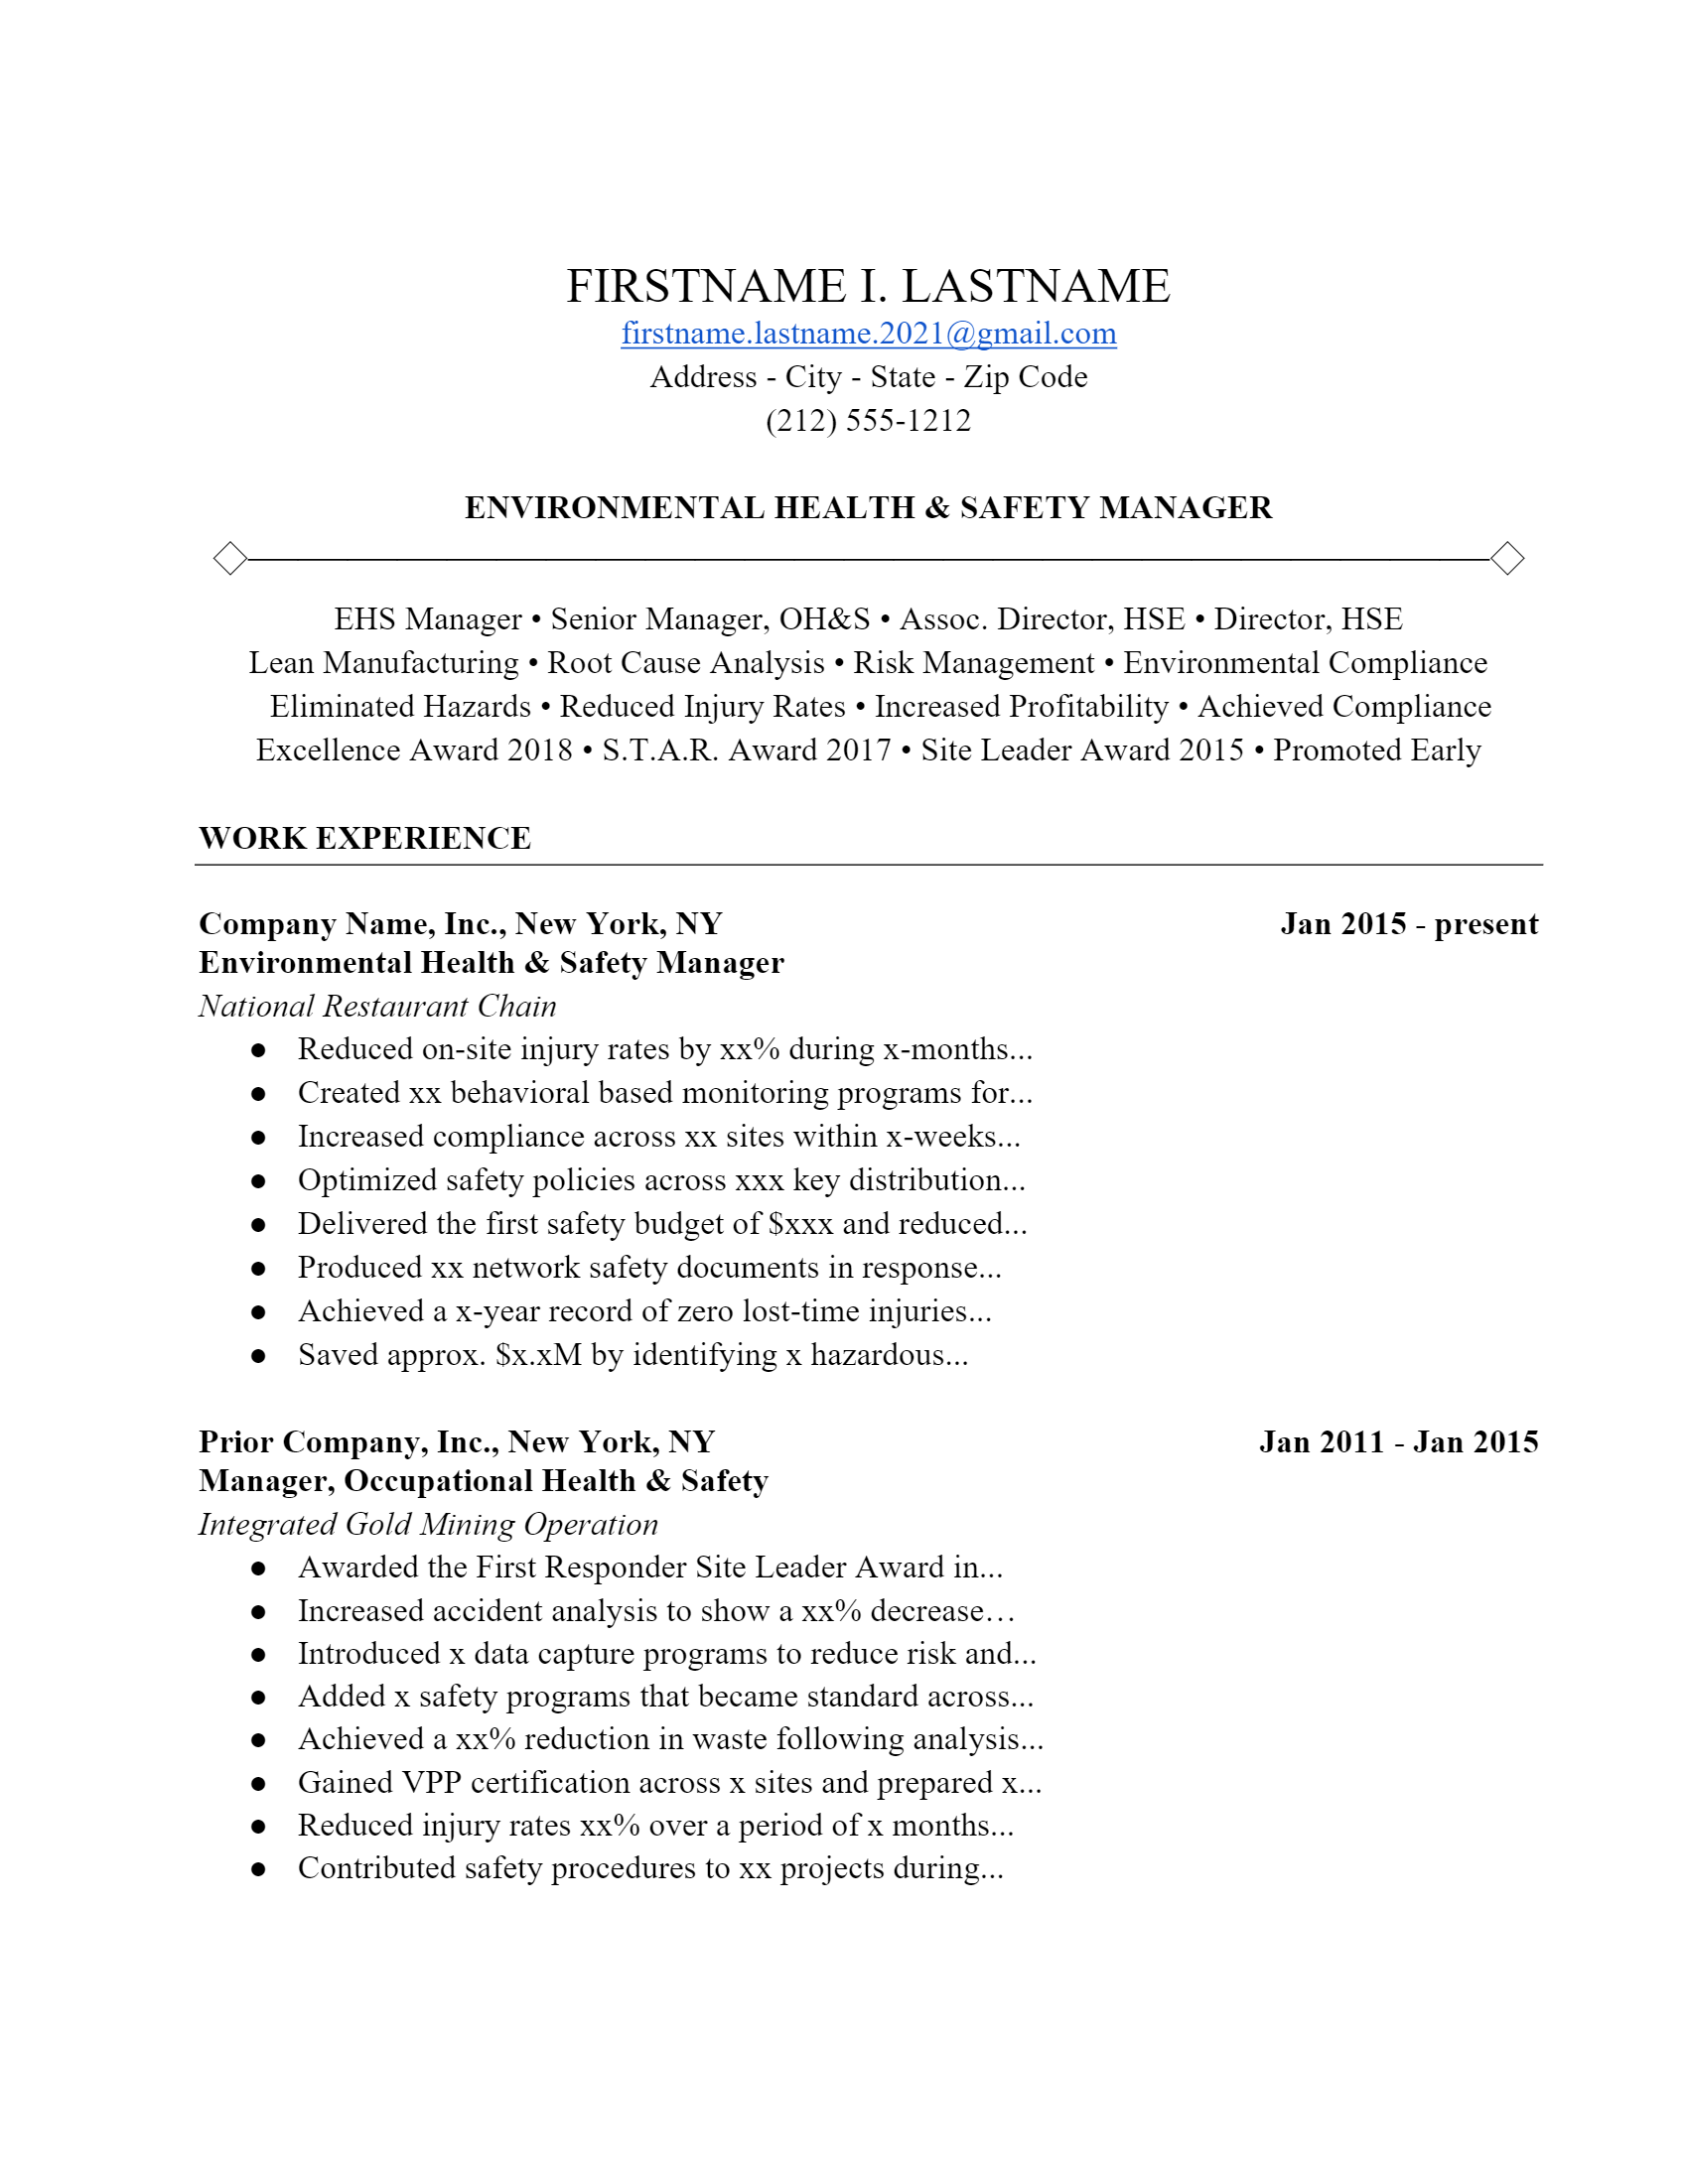 Environmental Manager Resume > Environmental Manager Resume .Docx (Word)